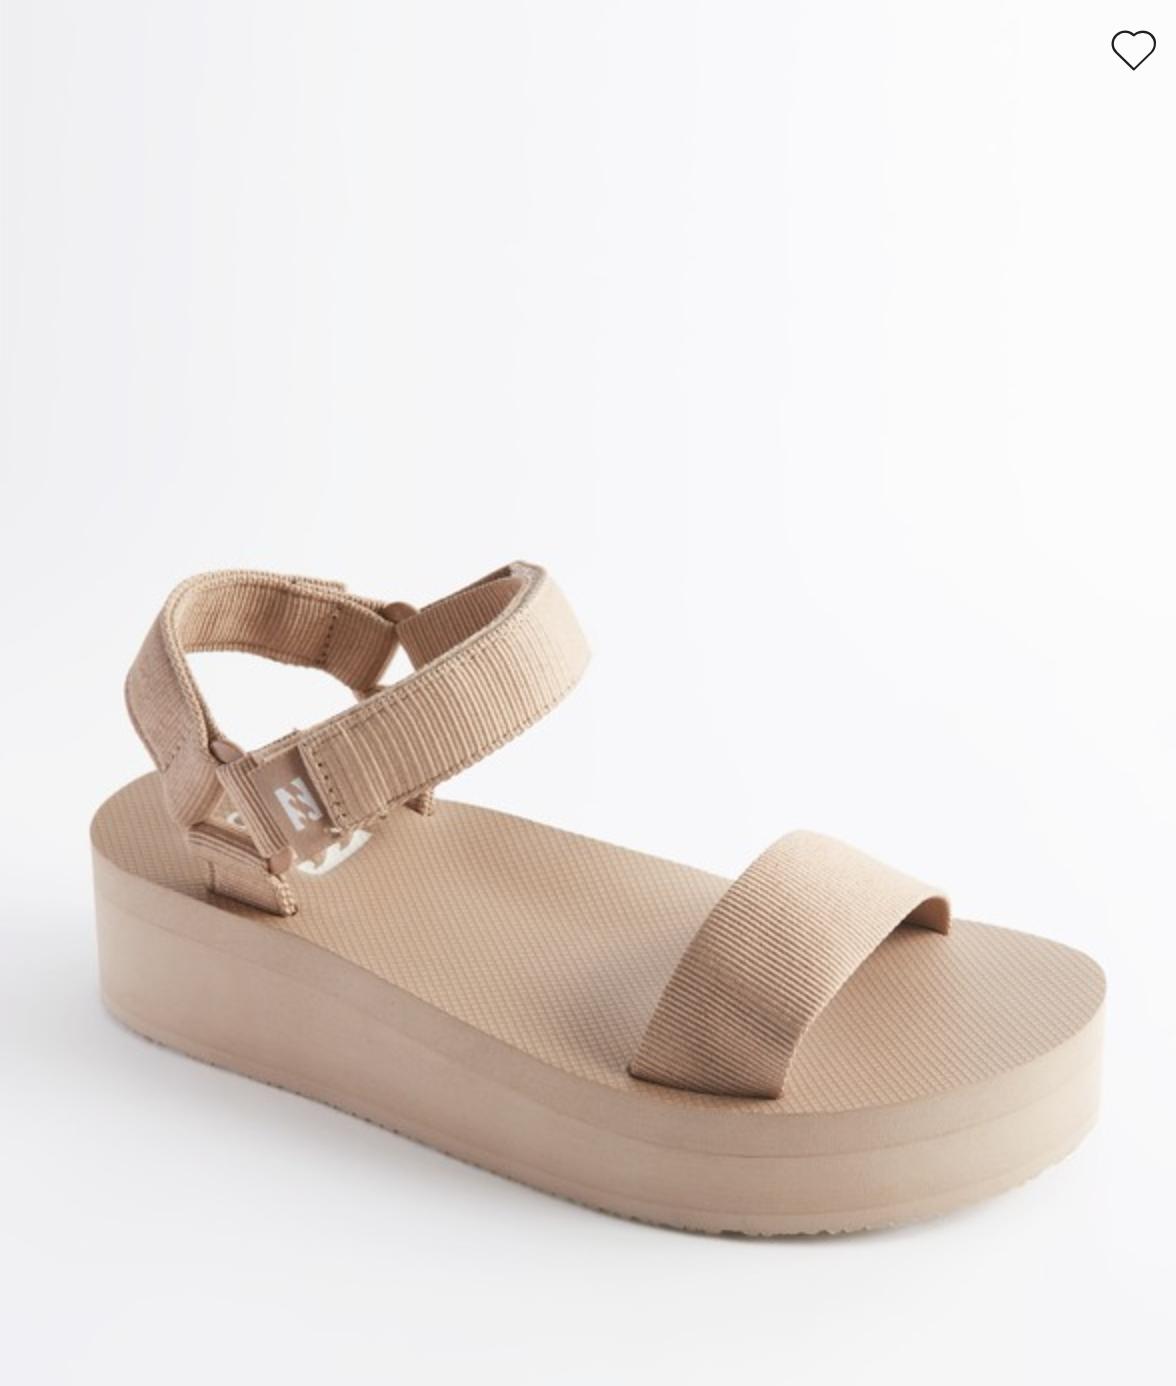 Kari On Platform Sandal